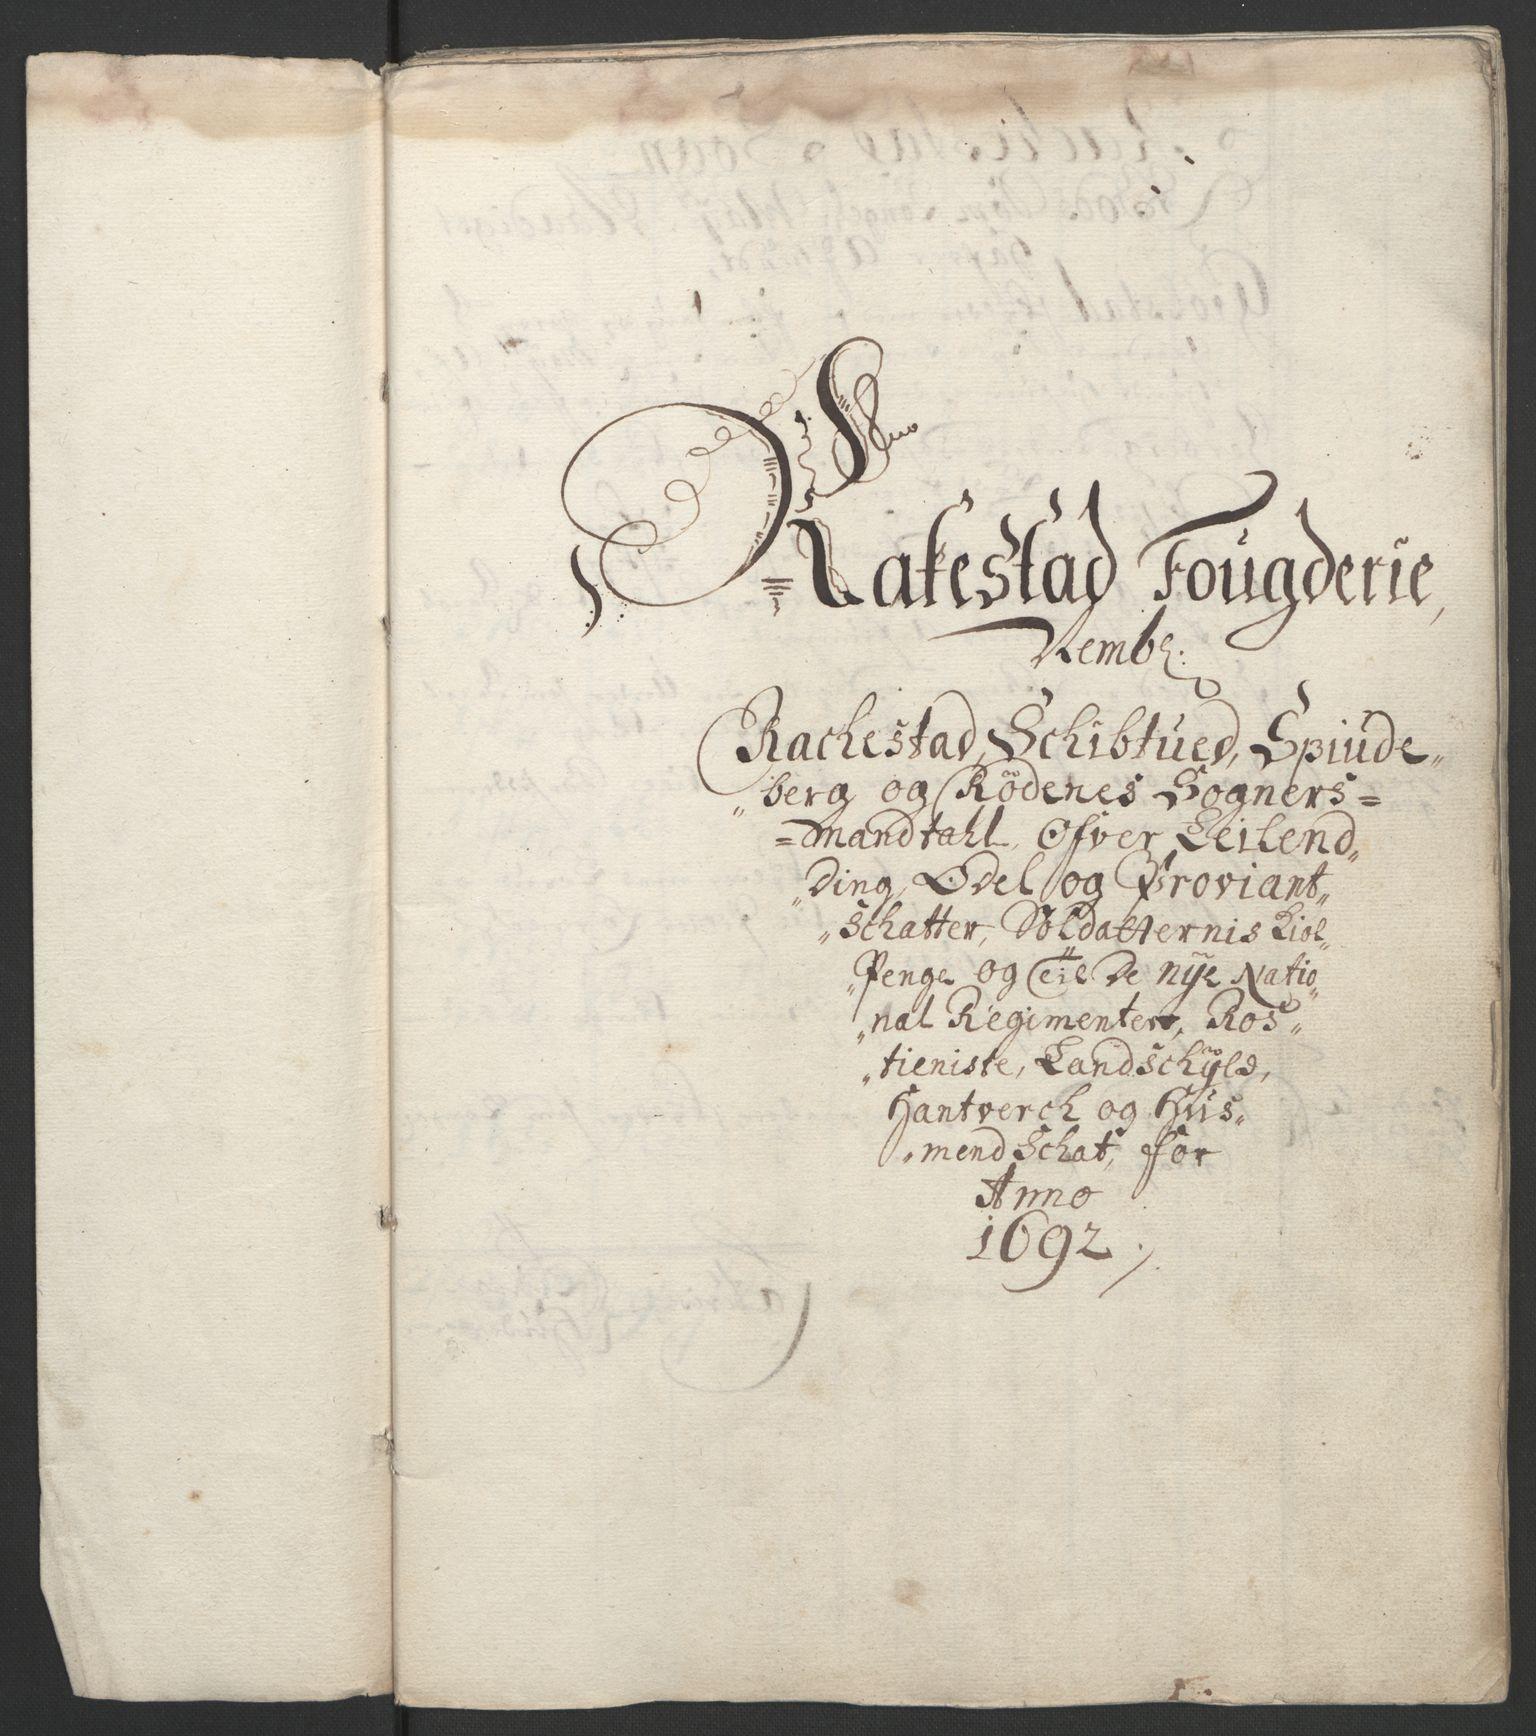 RA, Rentekammeret inntil 1814, Reviderte regnskaper, Fogderegnskap, R05/L0278: Fogderegnskap Rakkestad, 1691-1693, s. 208